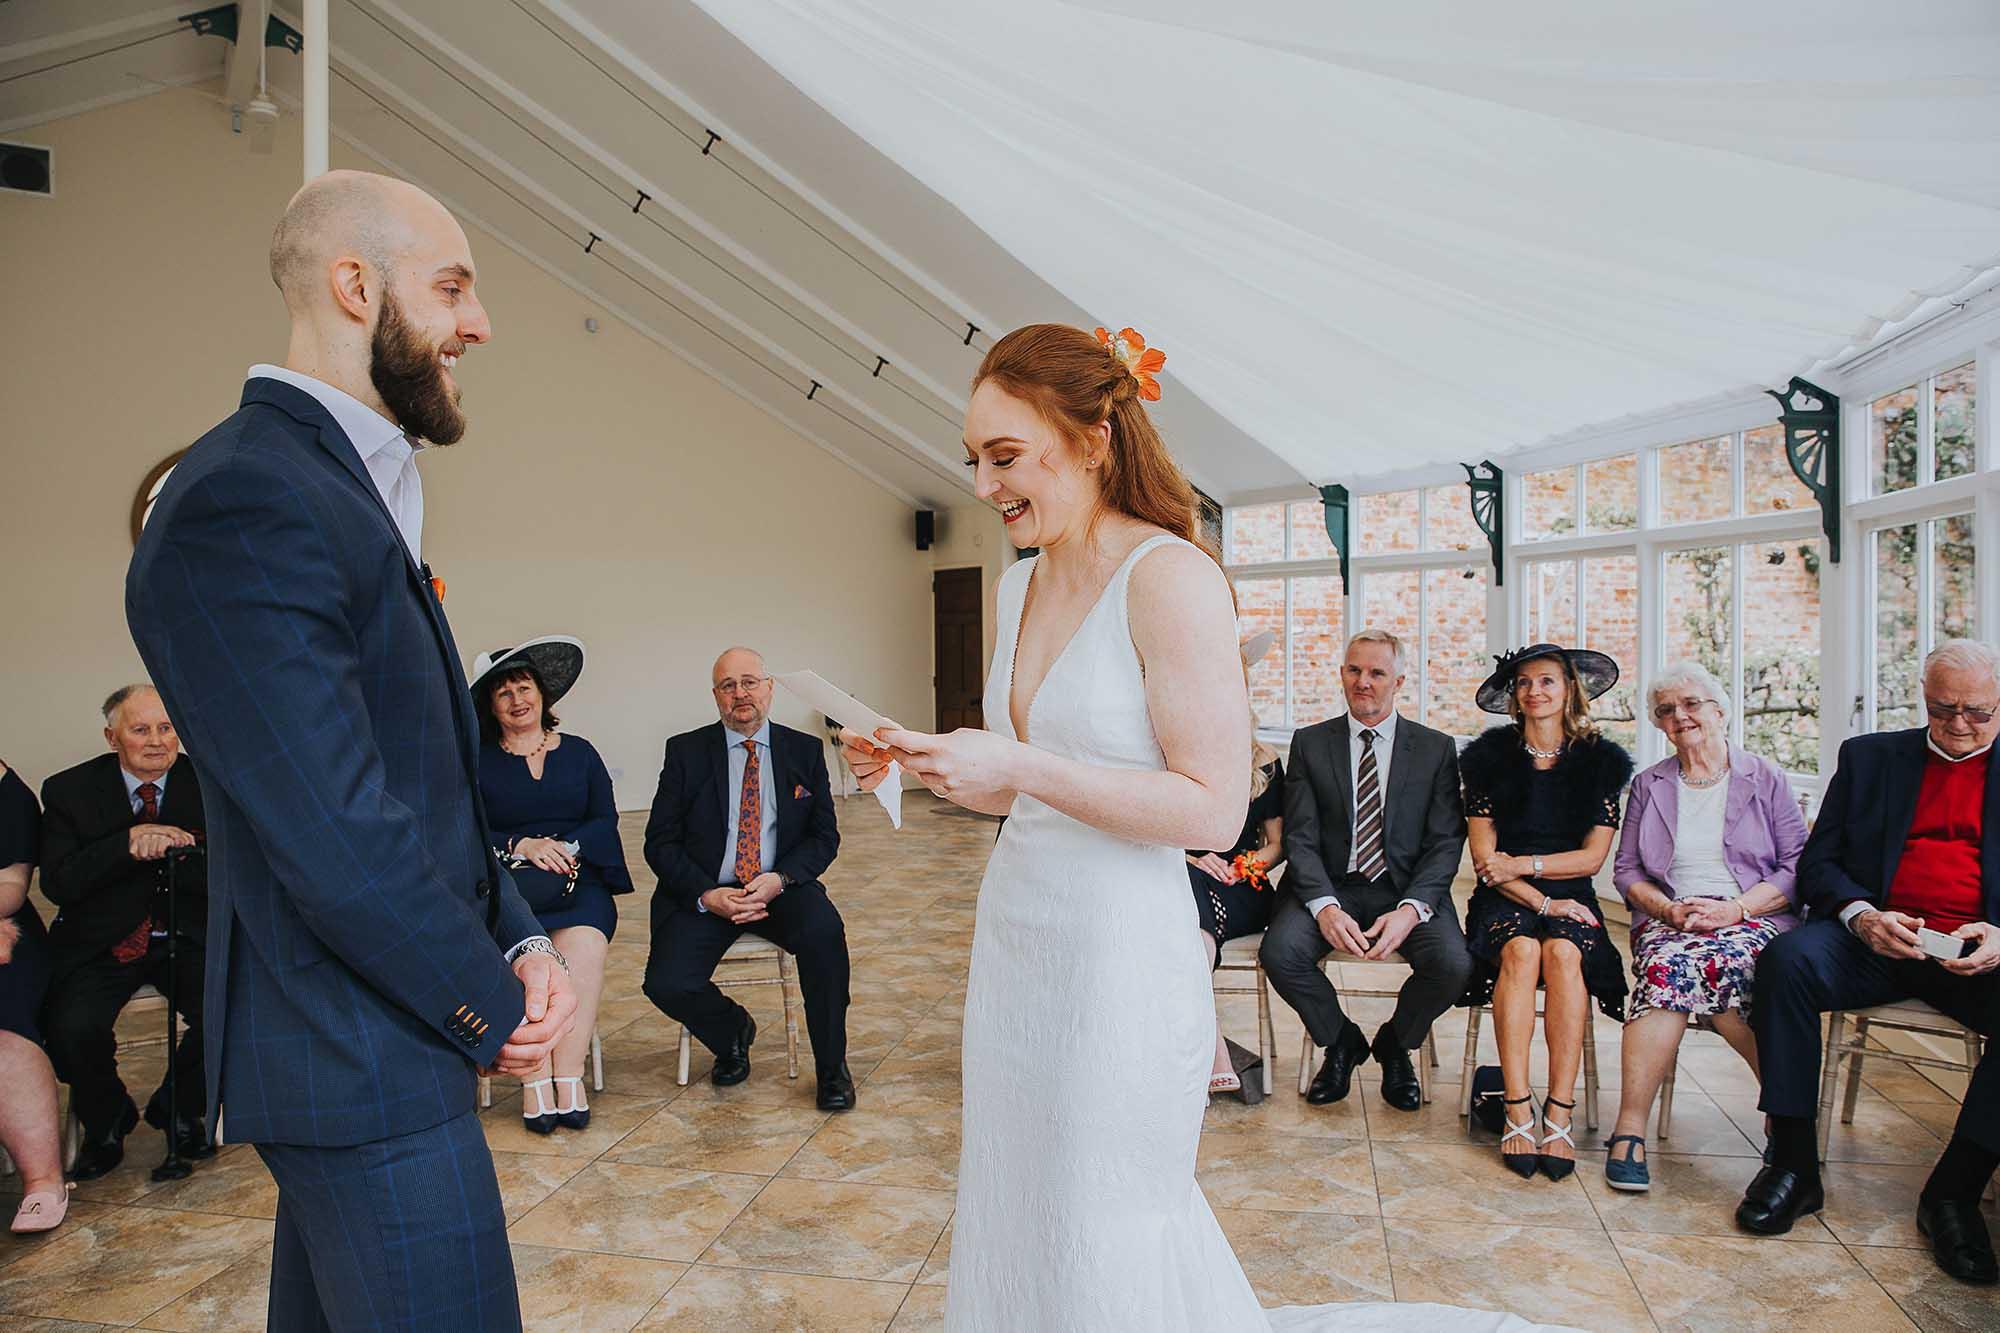 Combermere Abbey wedding ceremony